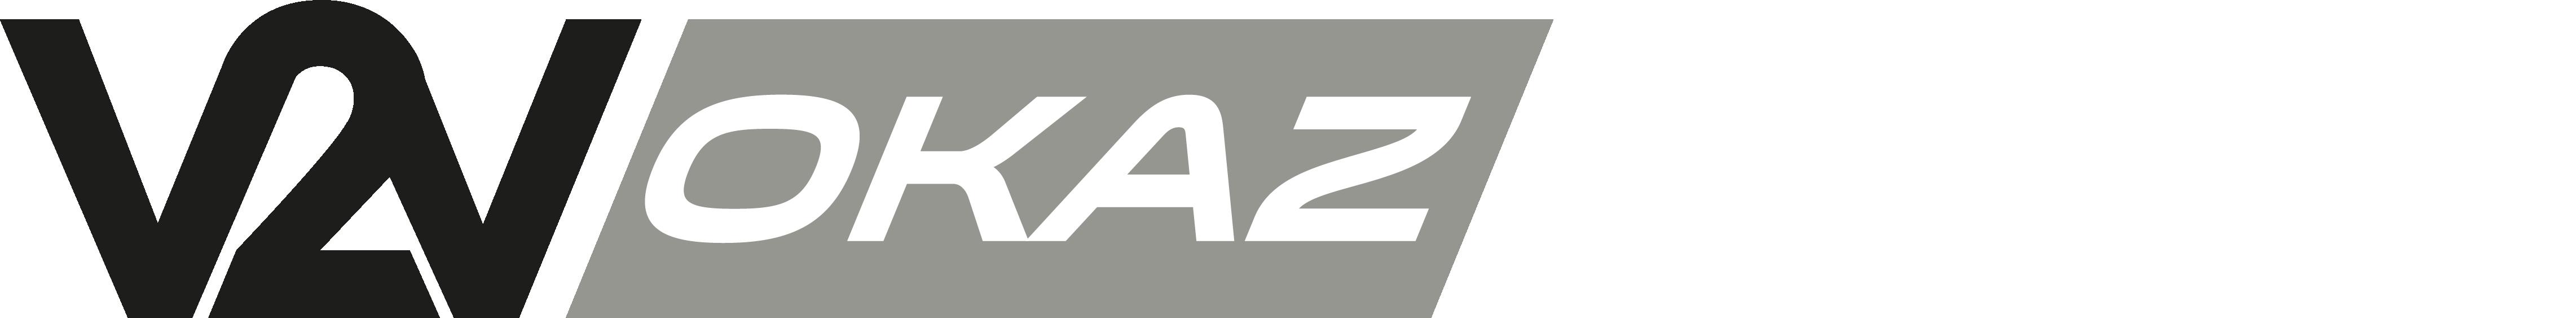 V2V OKAZ - Saint Jory